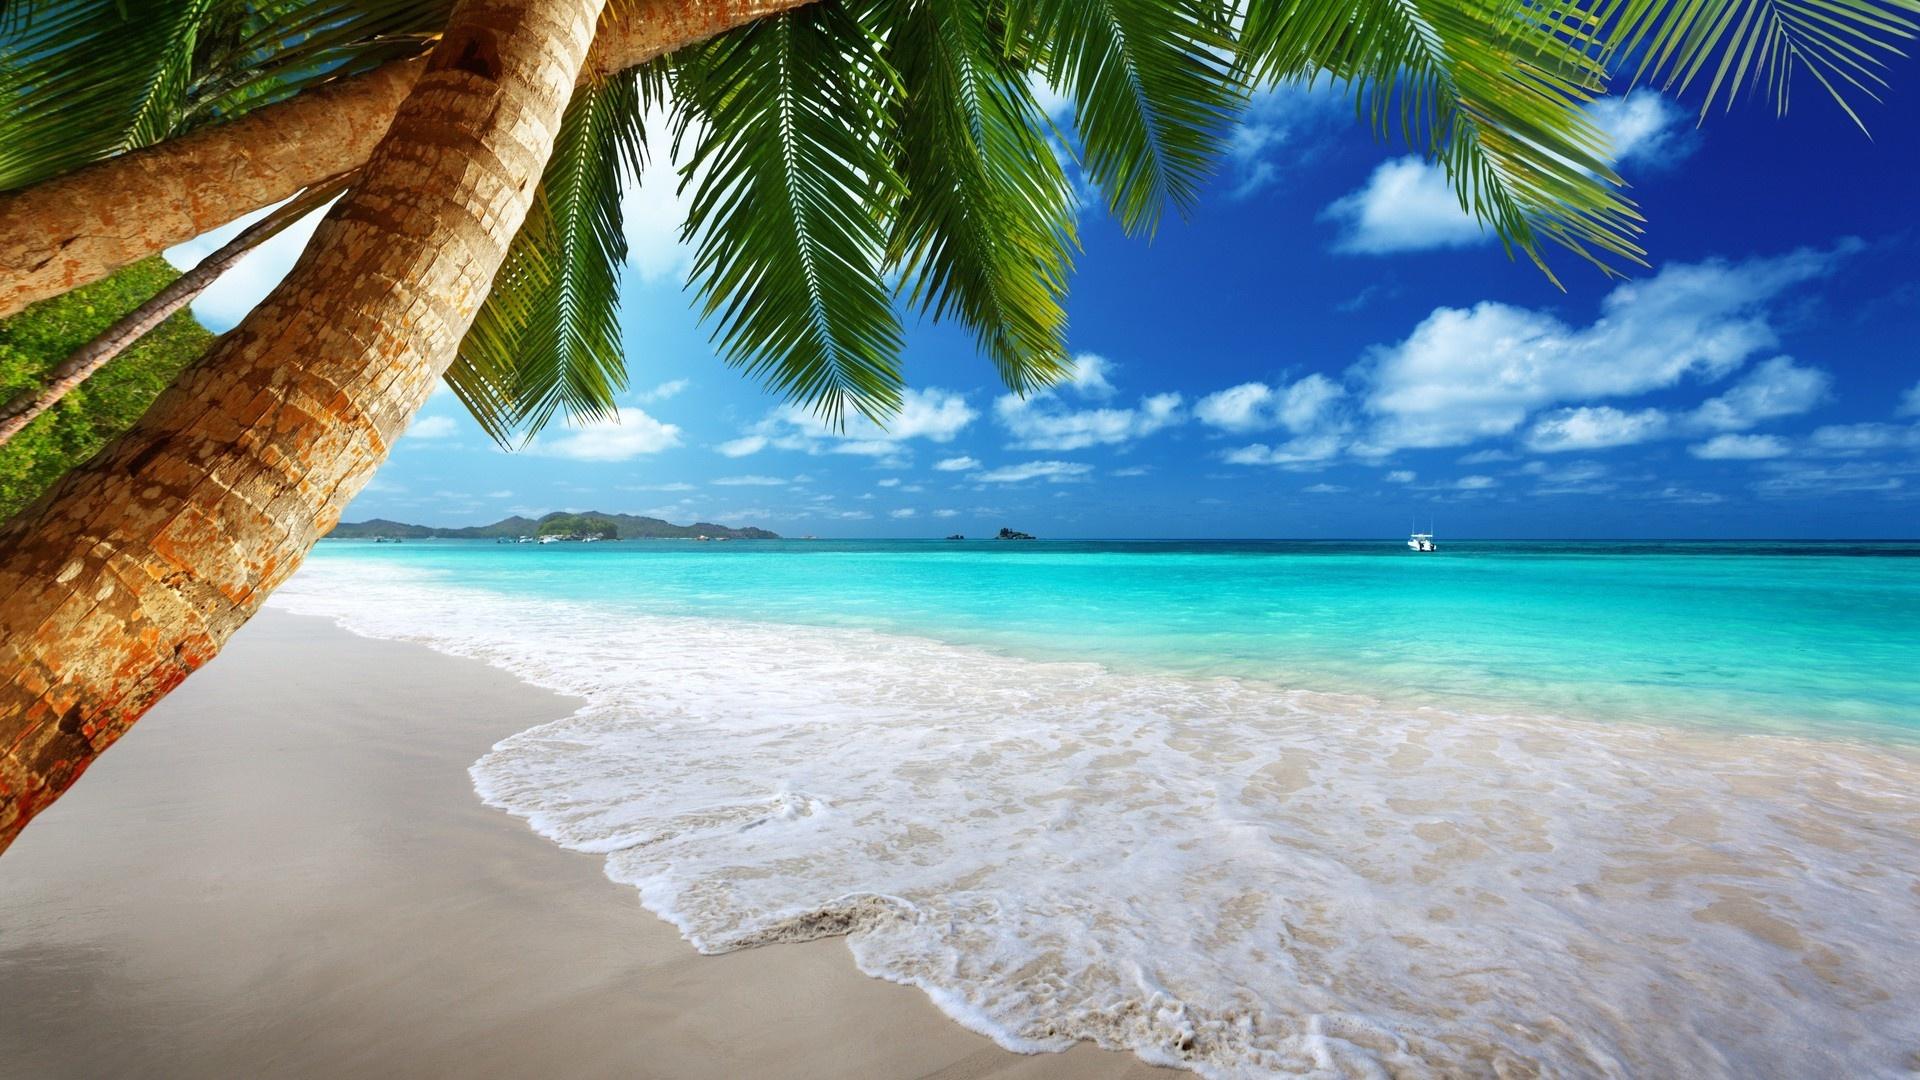 Beach free photo